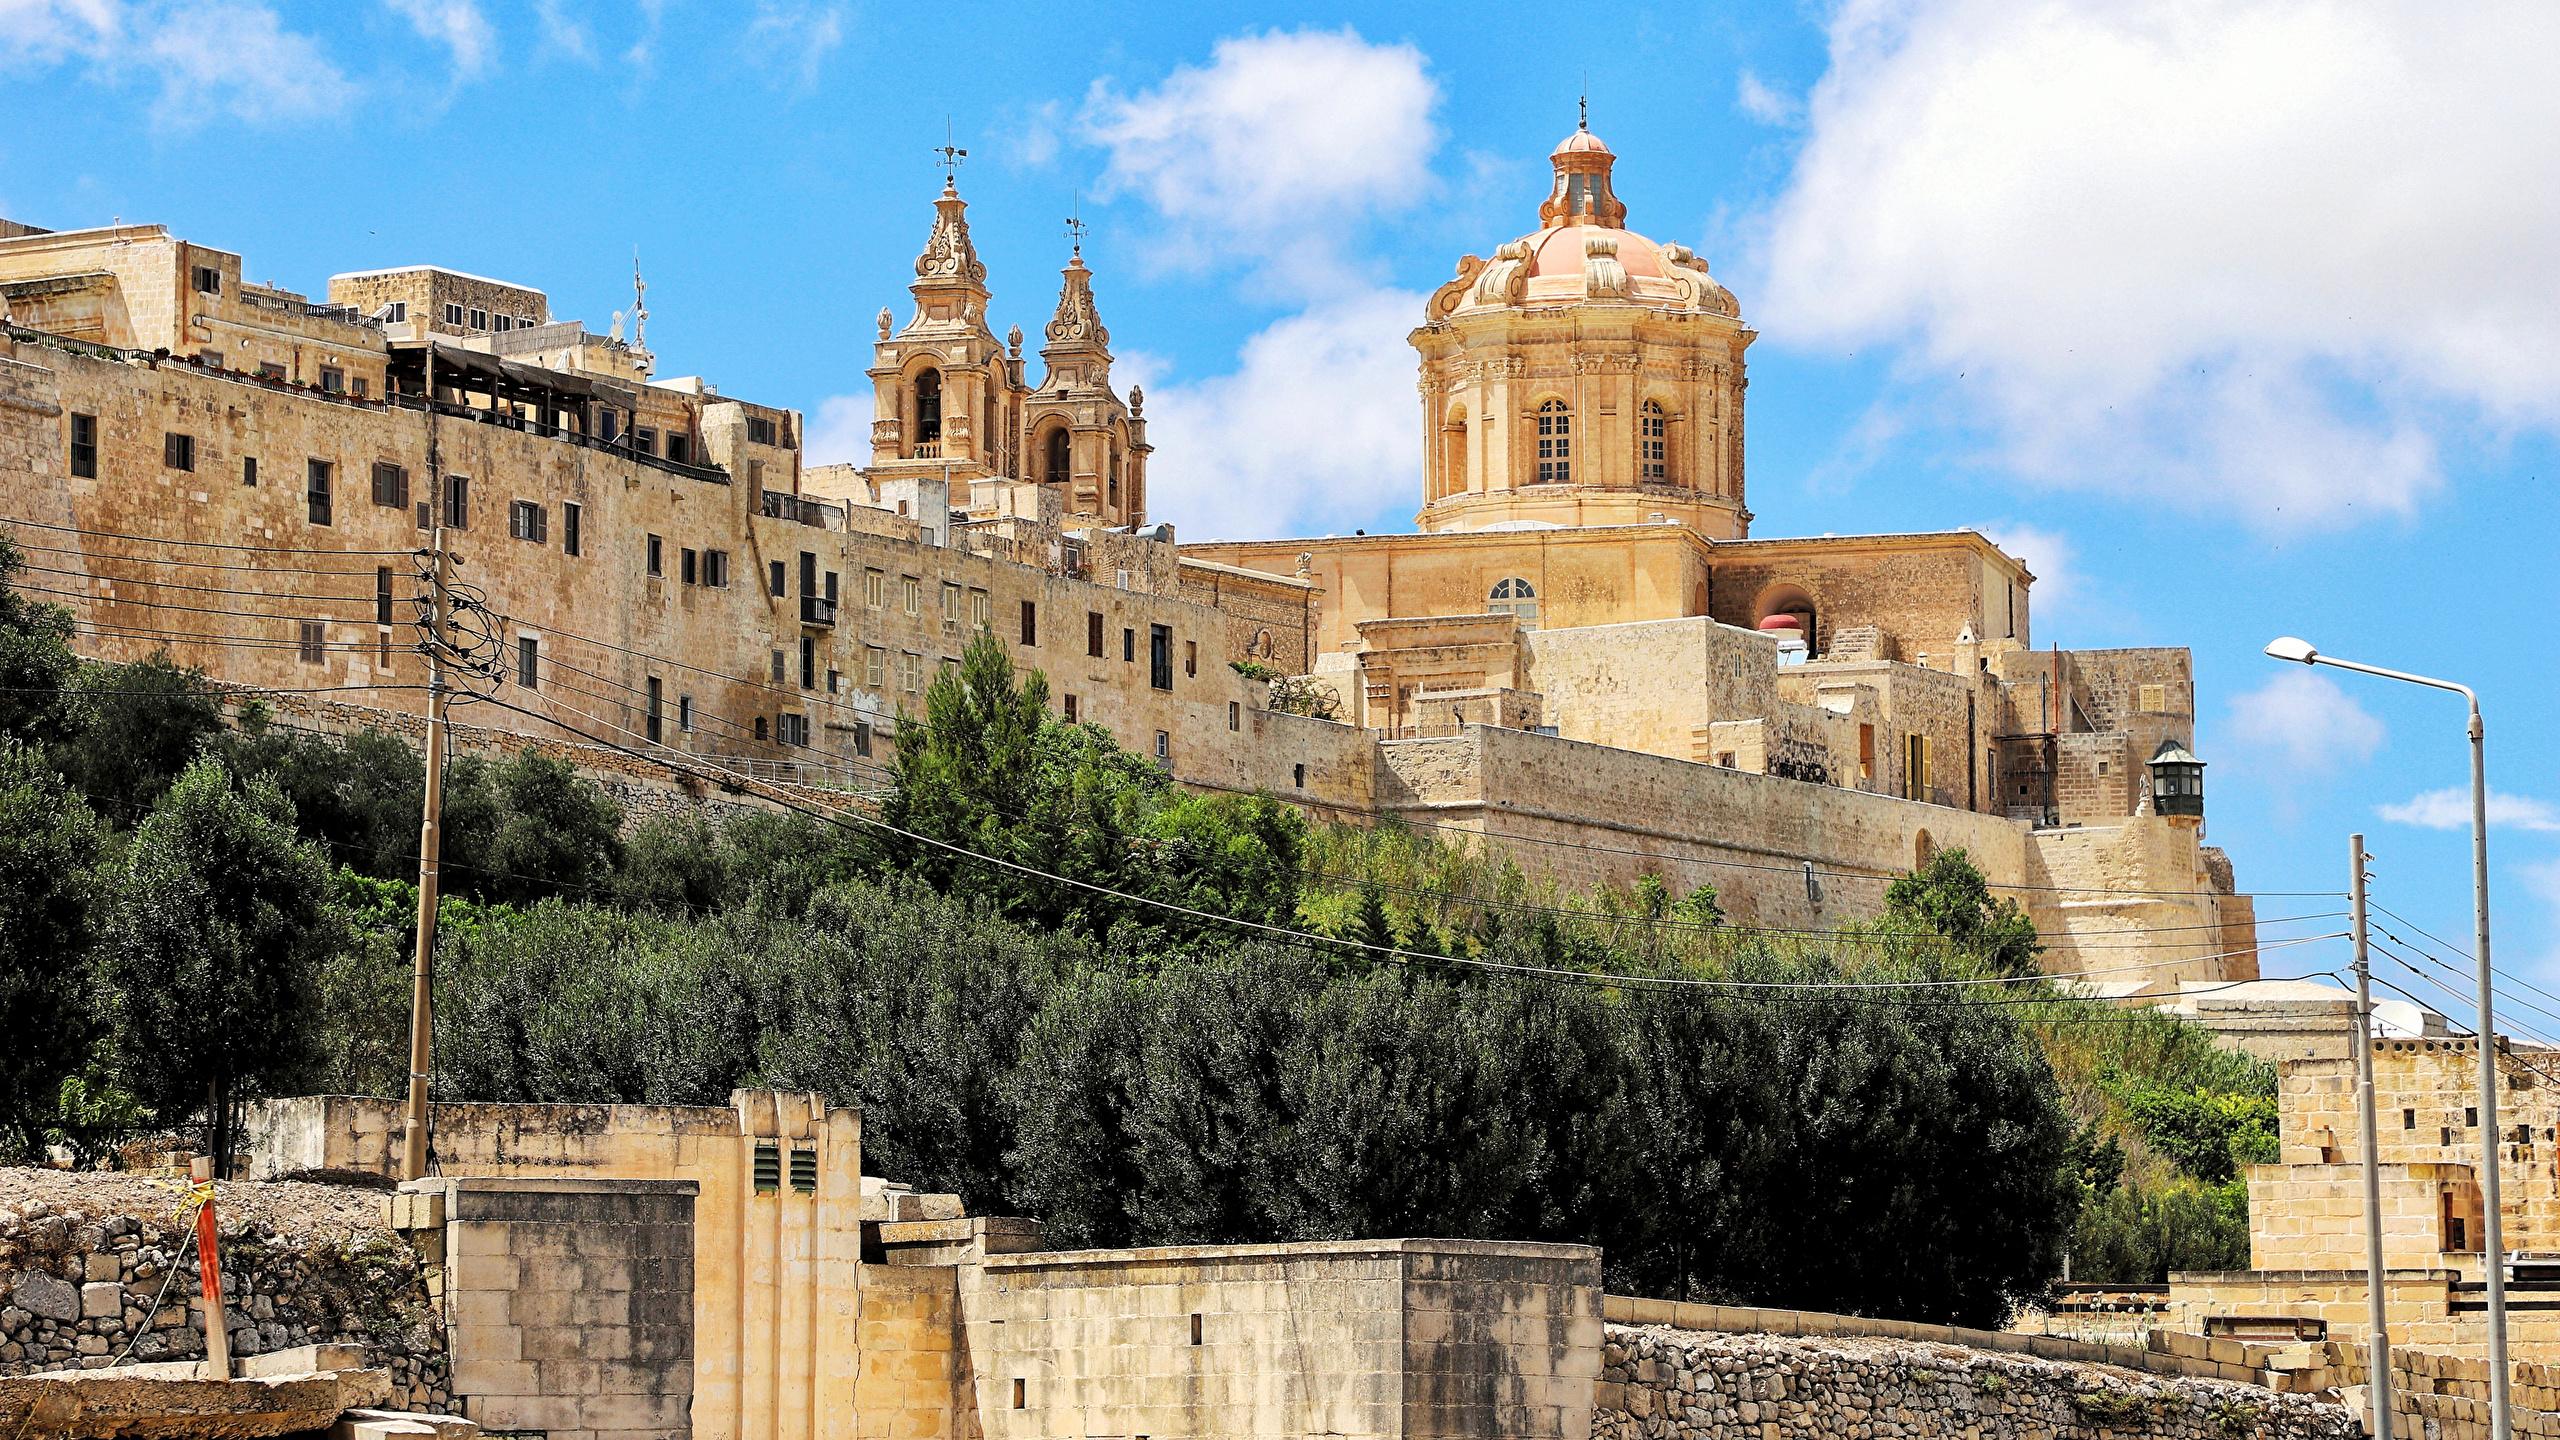 Pictures Malta Mdina Cities Building 2560x1440 Images, Photos, Reviews